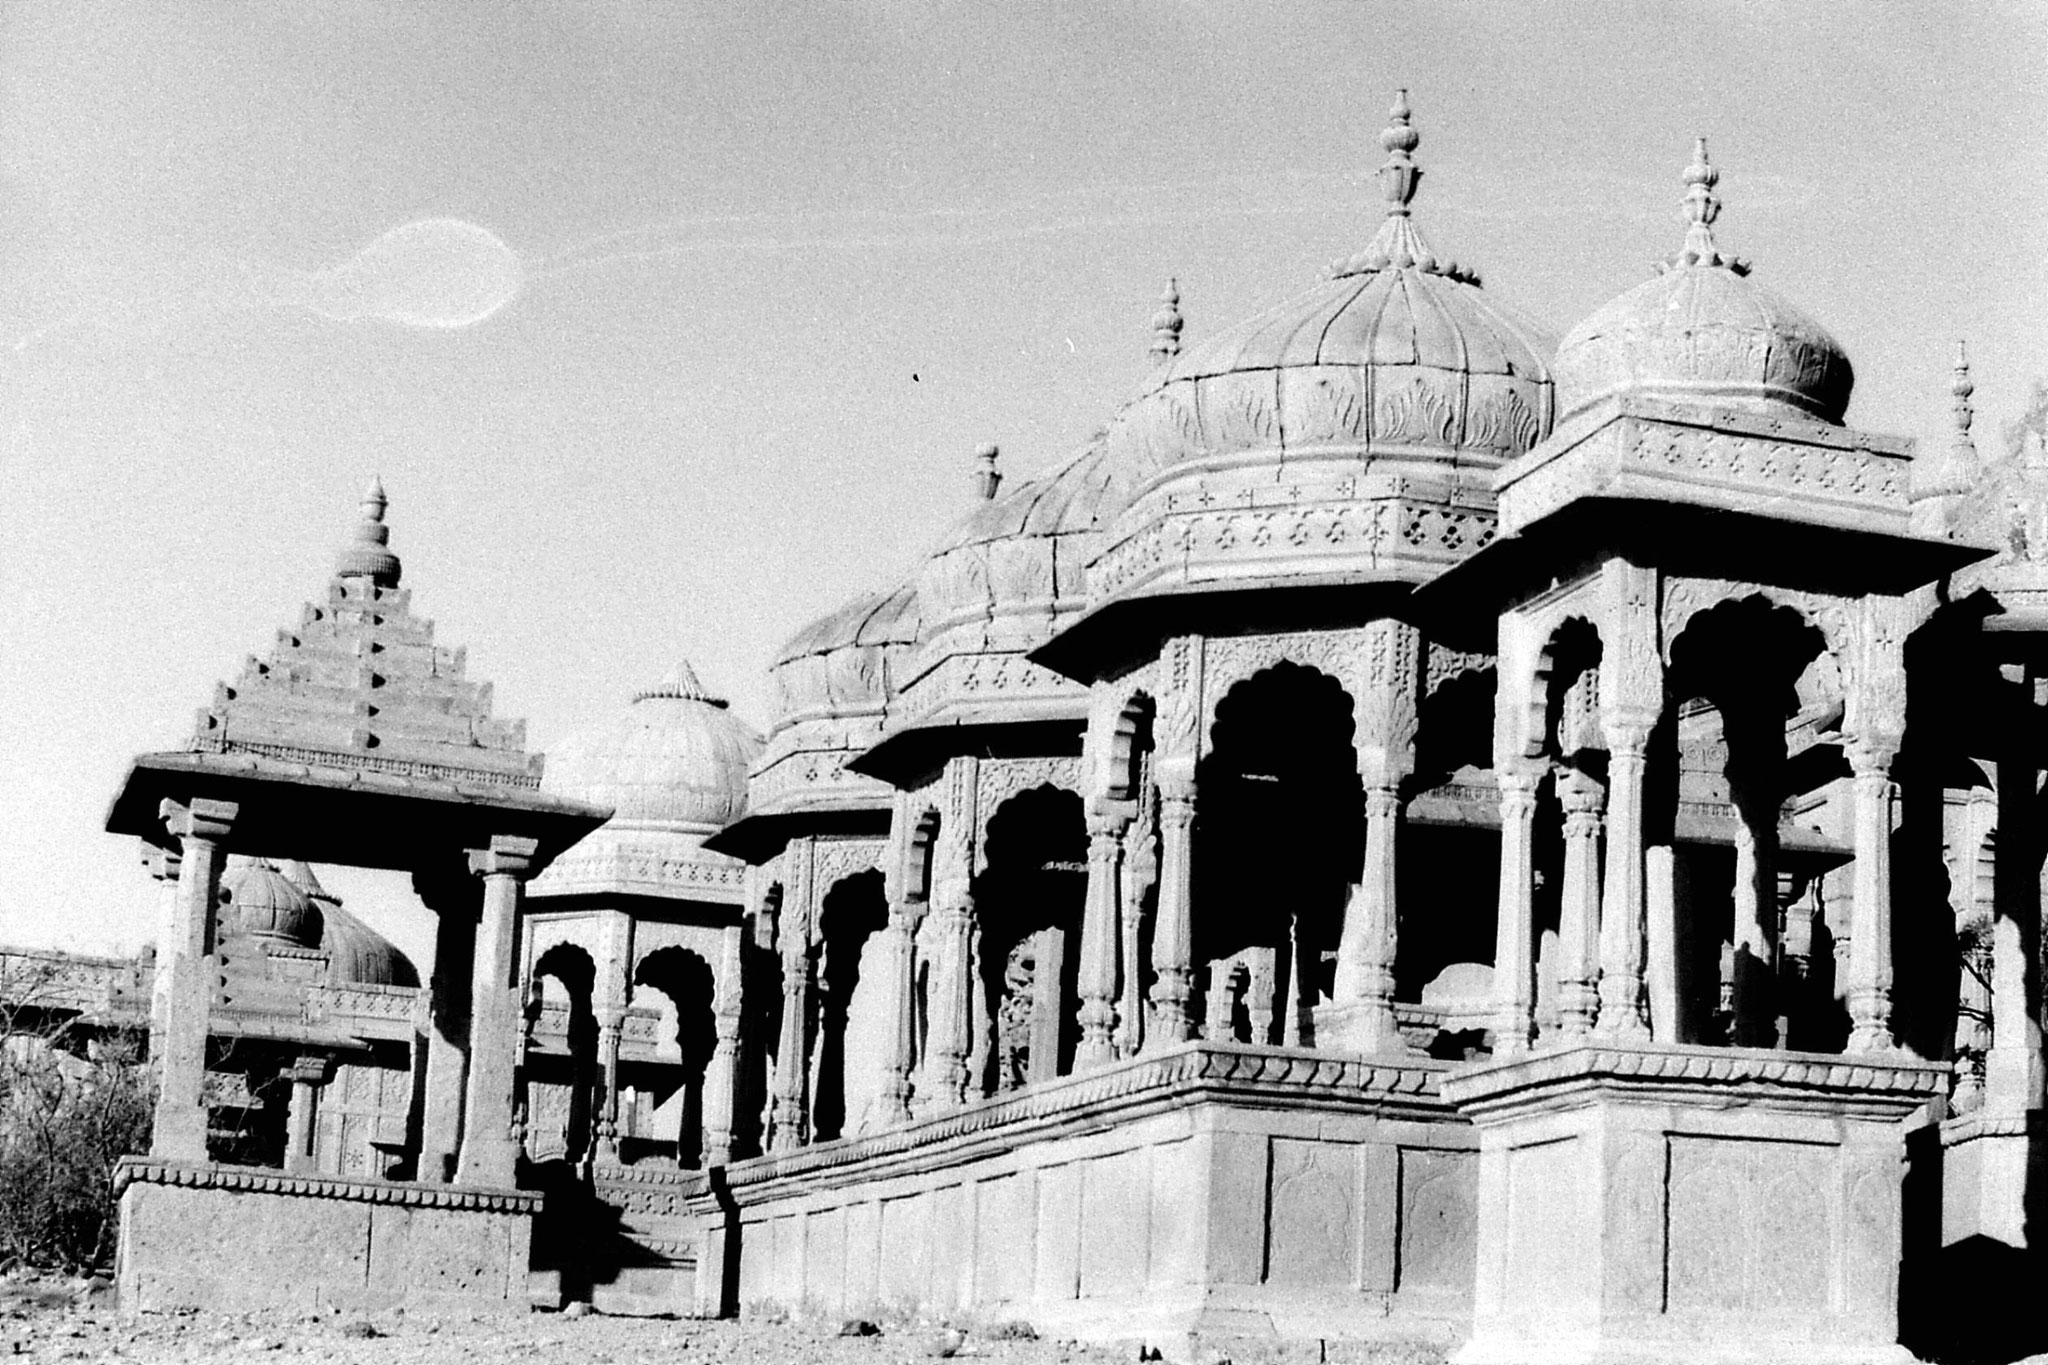 4/12/1989: 6: Jaisalmer cenotaph domes